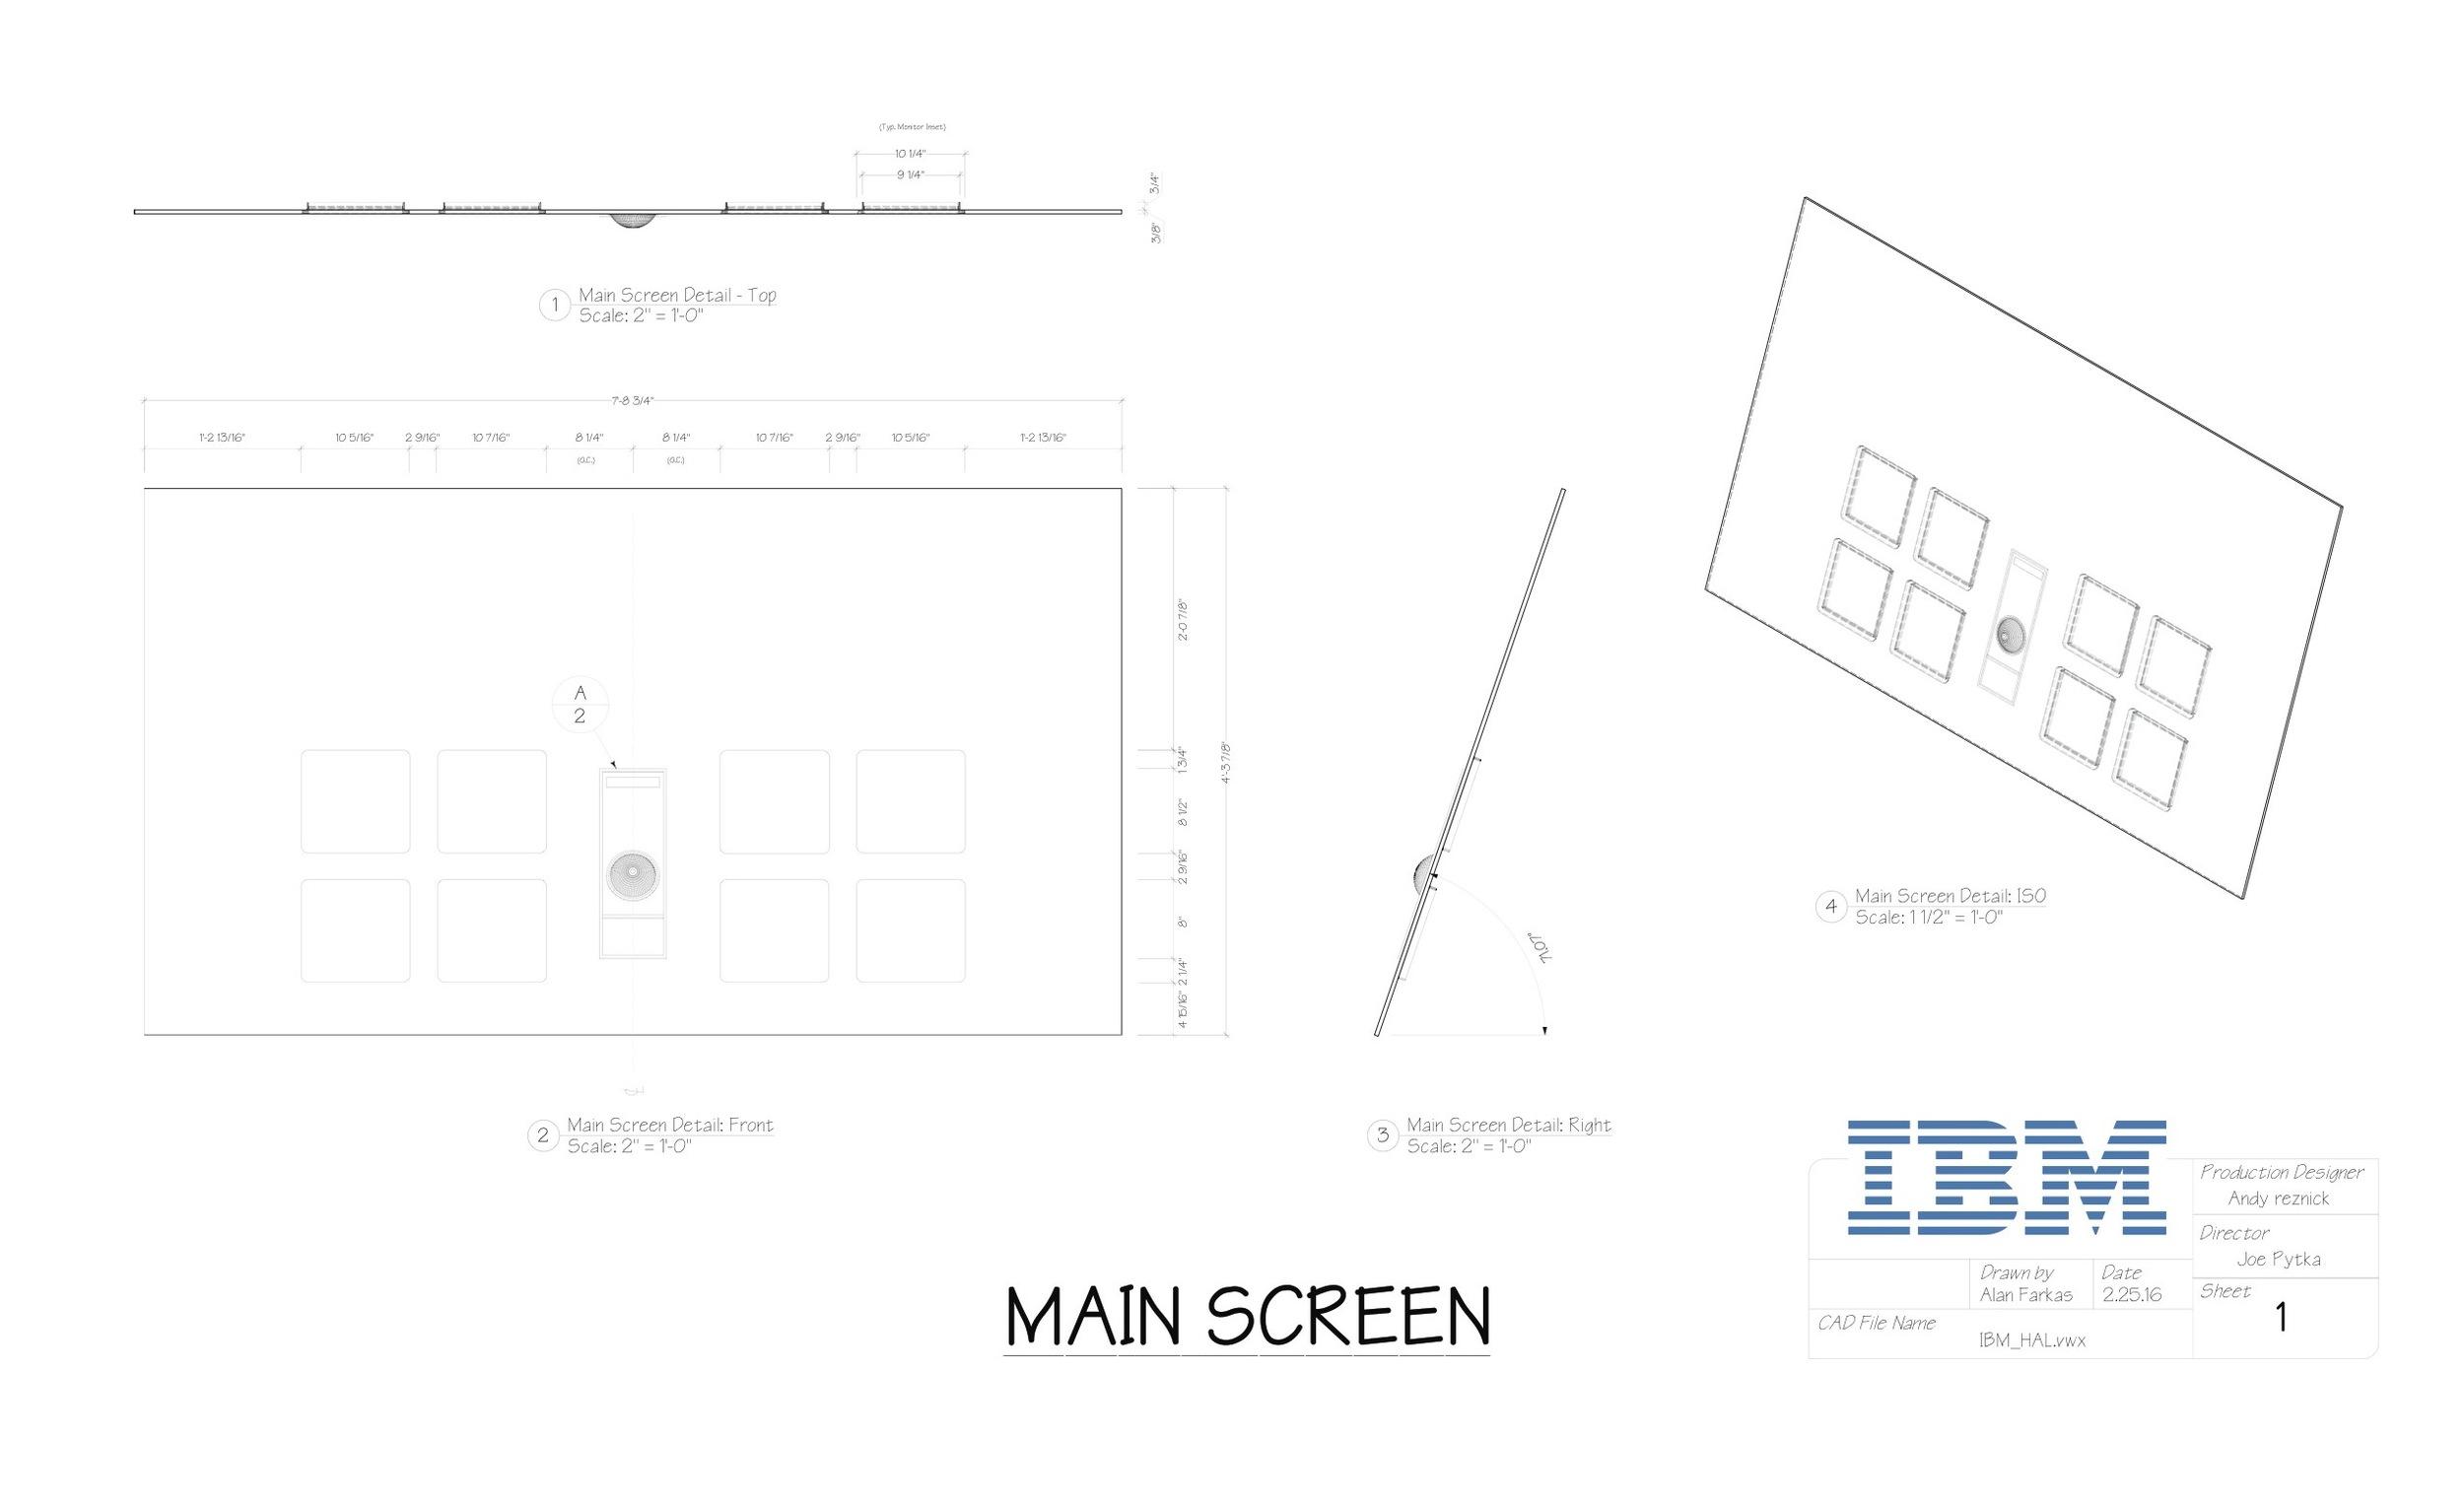 Alan Farkas_3D Set Design + Illustration_Reduced 5.jpeg